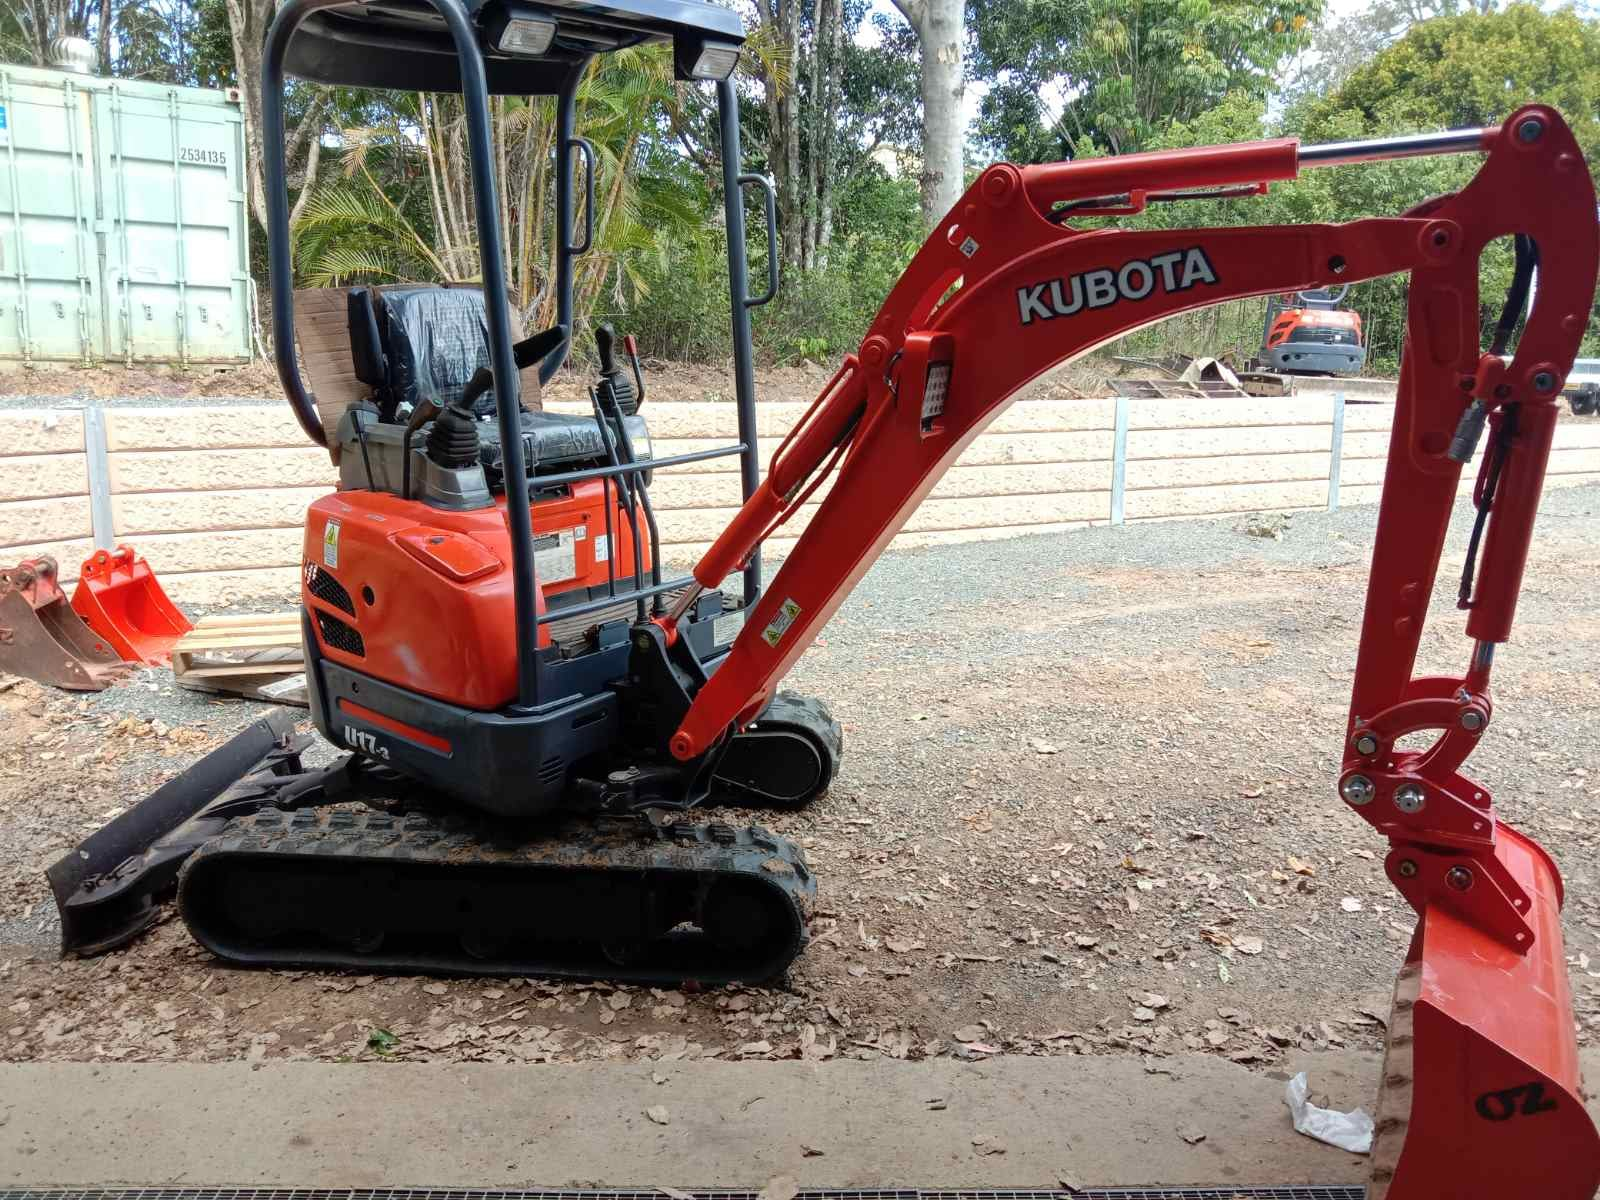 Excavator Kubota U1.7 (1.7t Machine on trailer) for wet or dry hire.